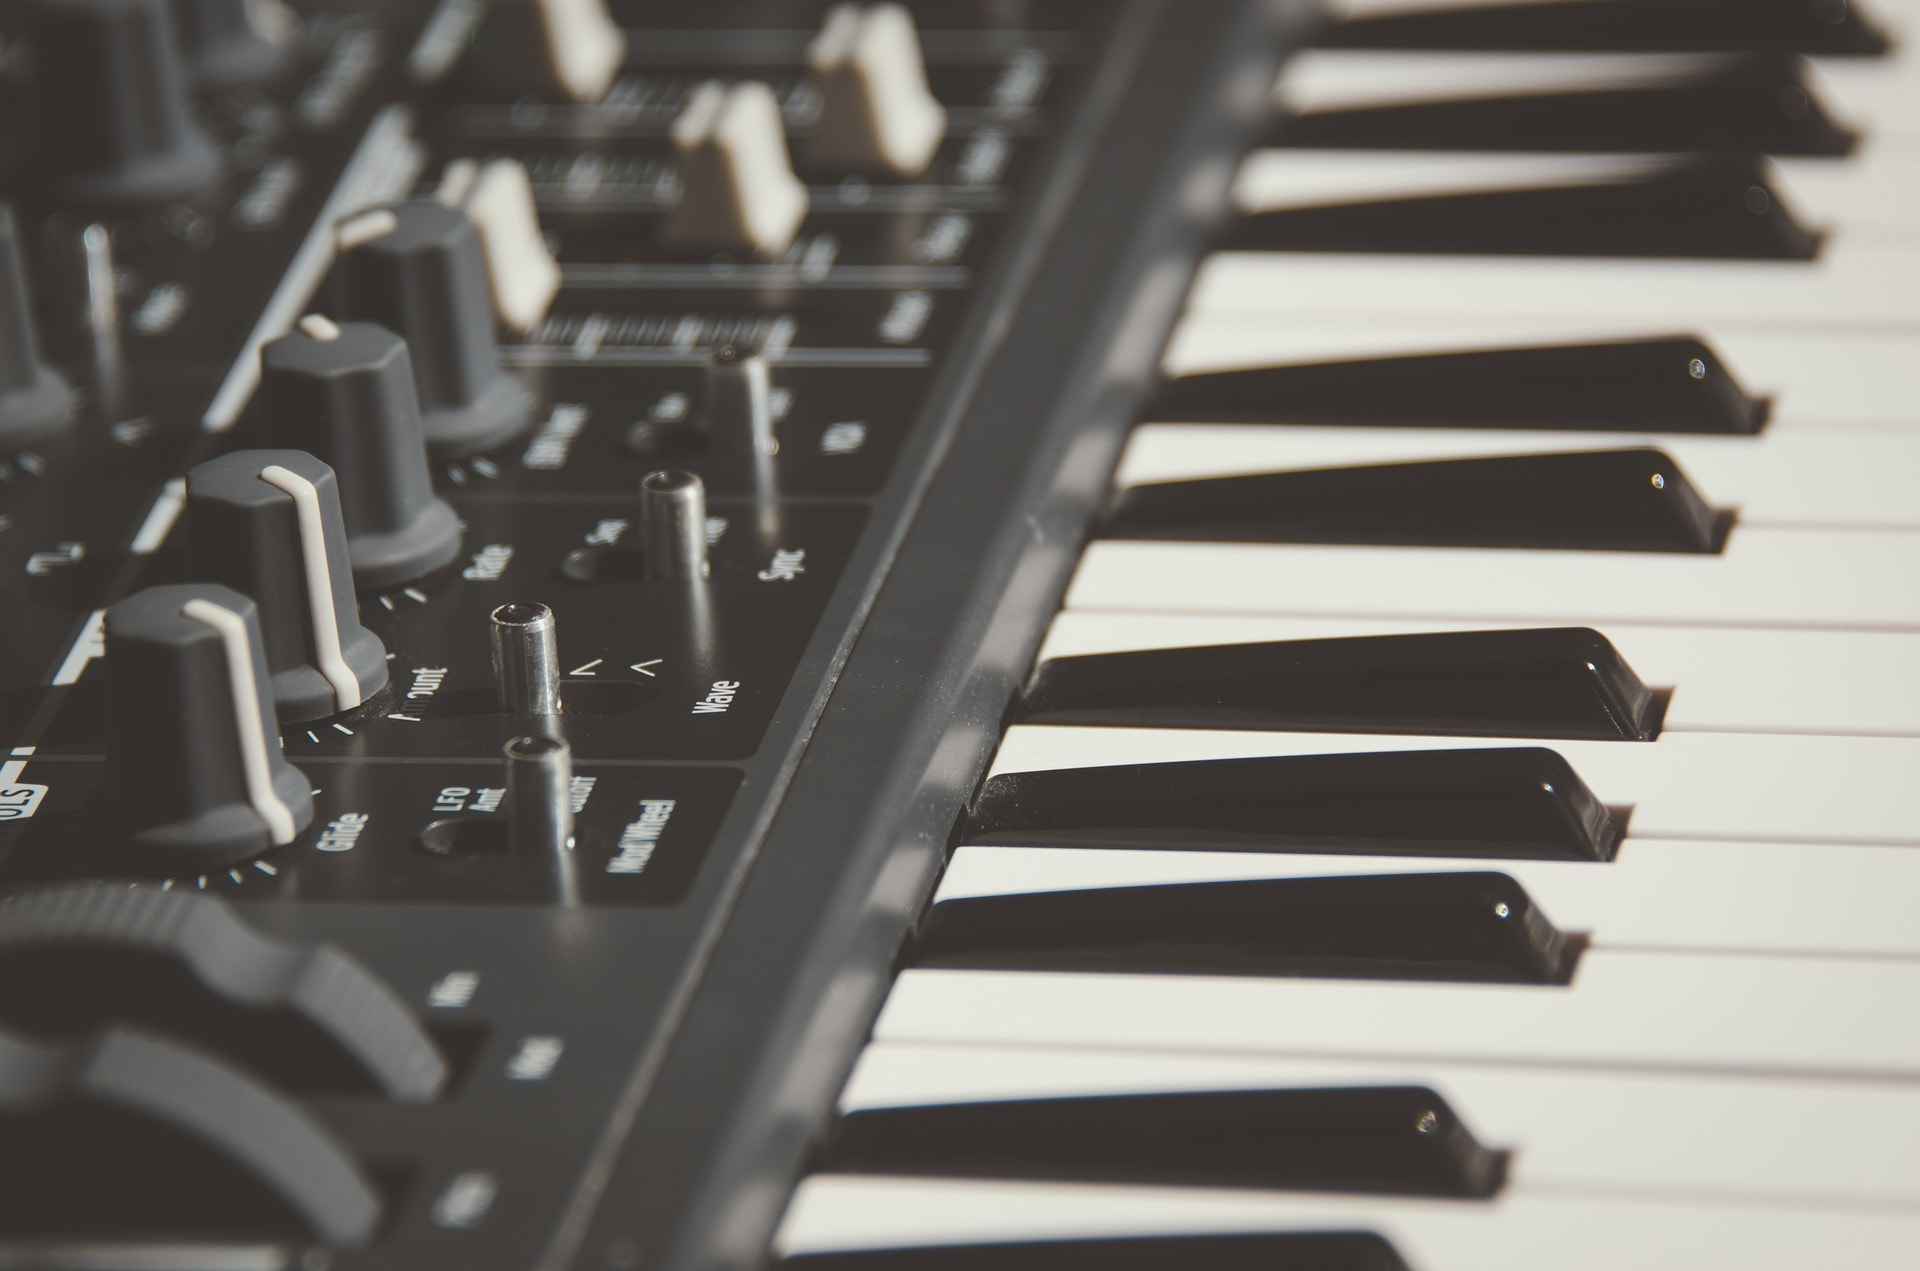 House Music Keyboard DJ Mixes